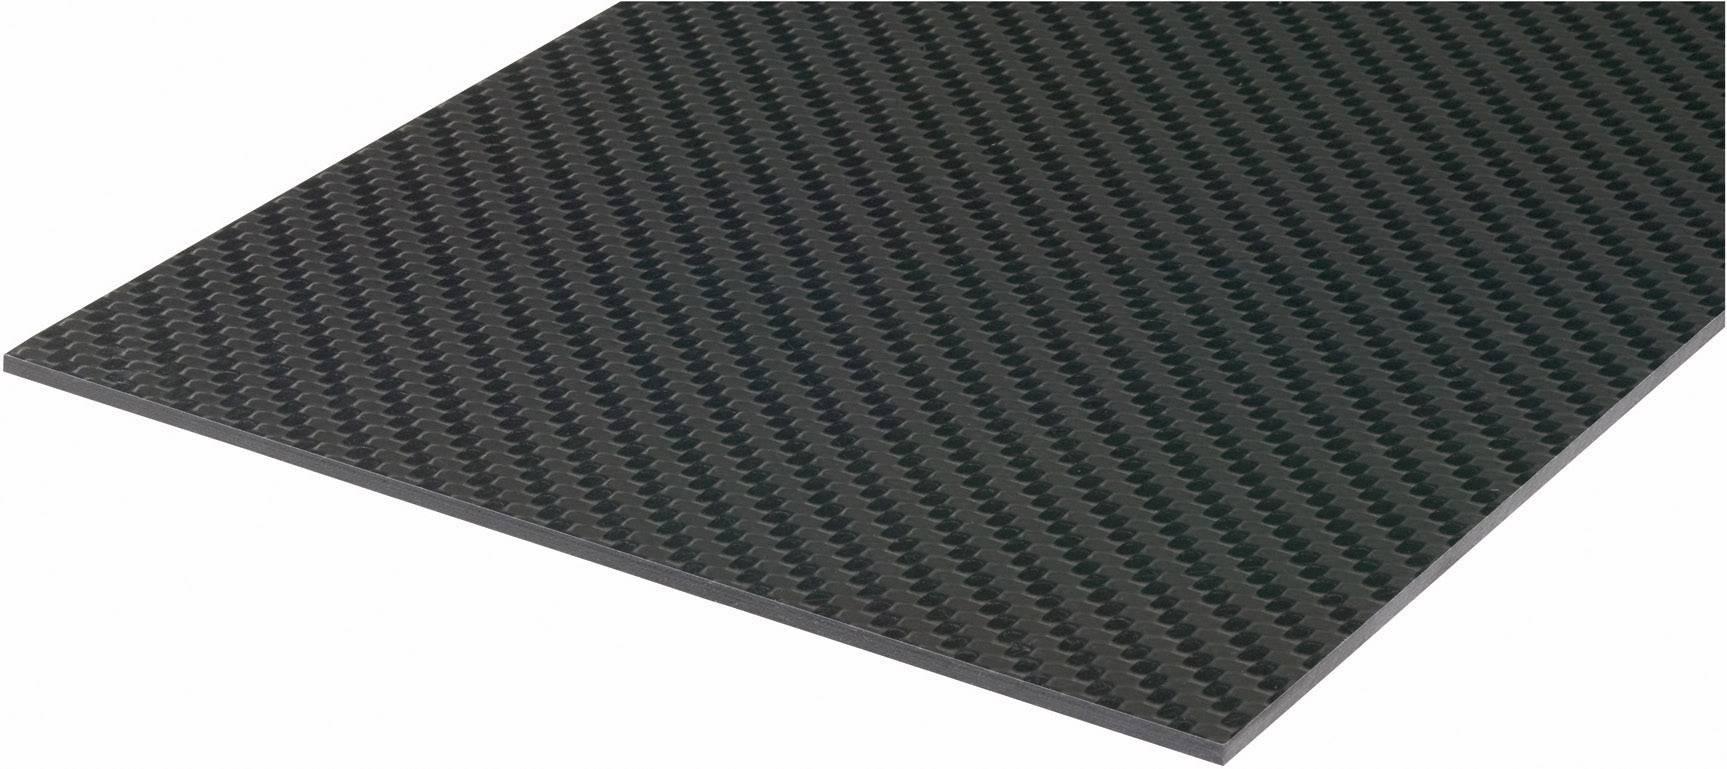 Uhlíková prepreg doska Carbotec 229916, (d x š) 340 mm x 150 mm x 1.5 mm